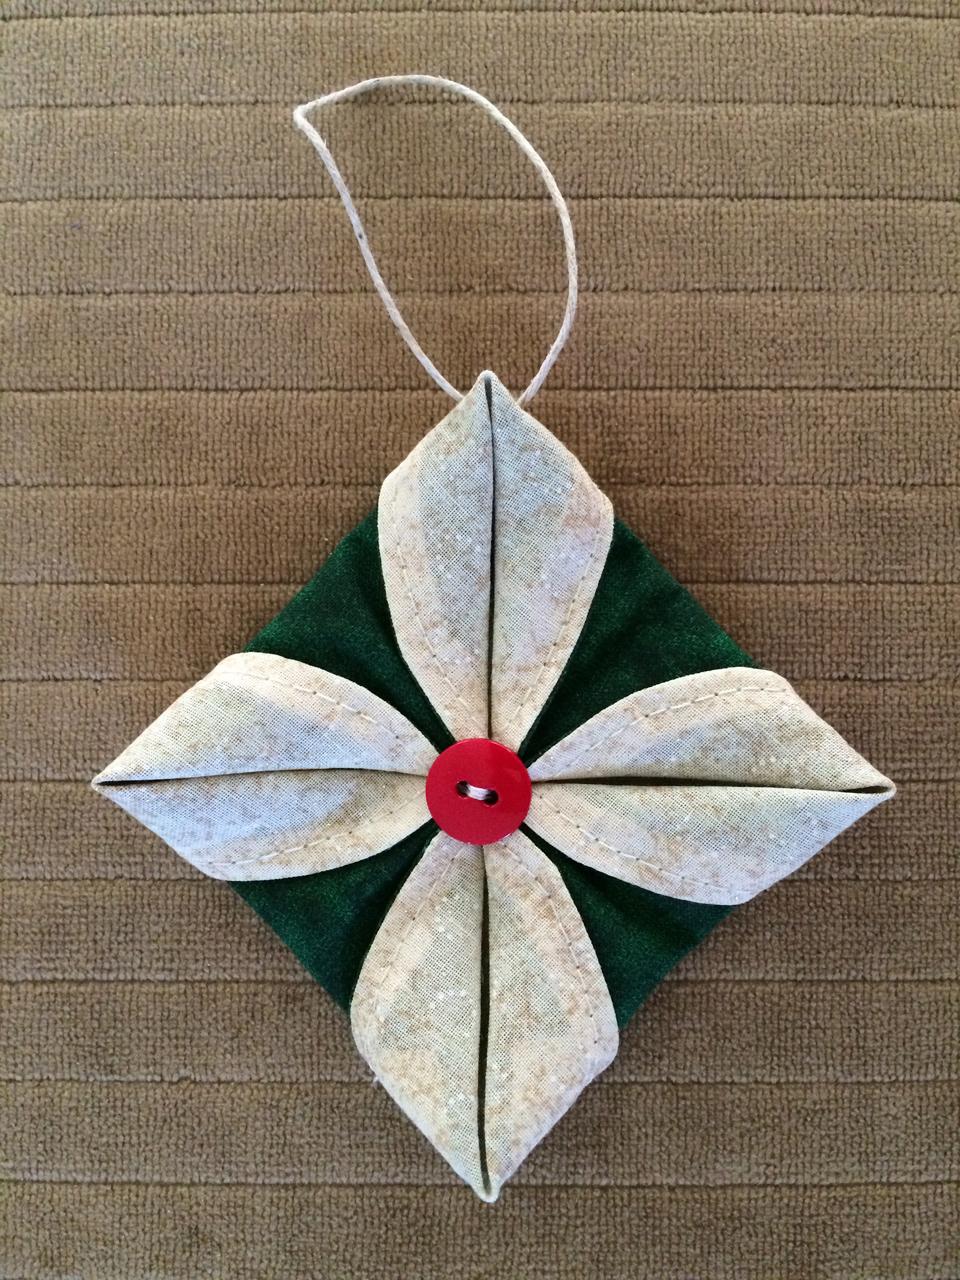 Fabric Ornaments Patterns : Corners of My Life: folded fabric ornament